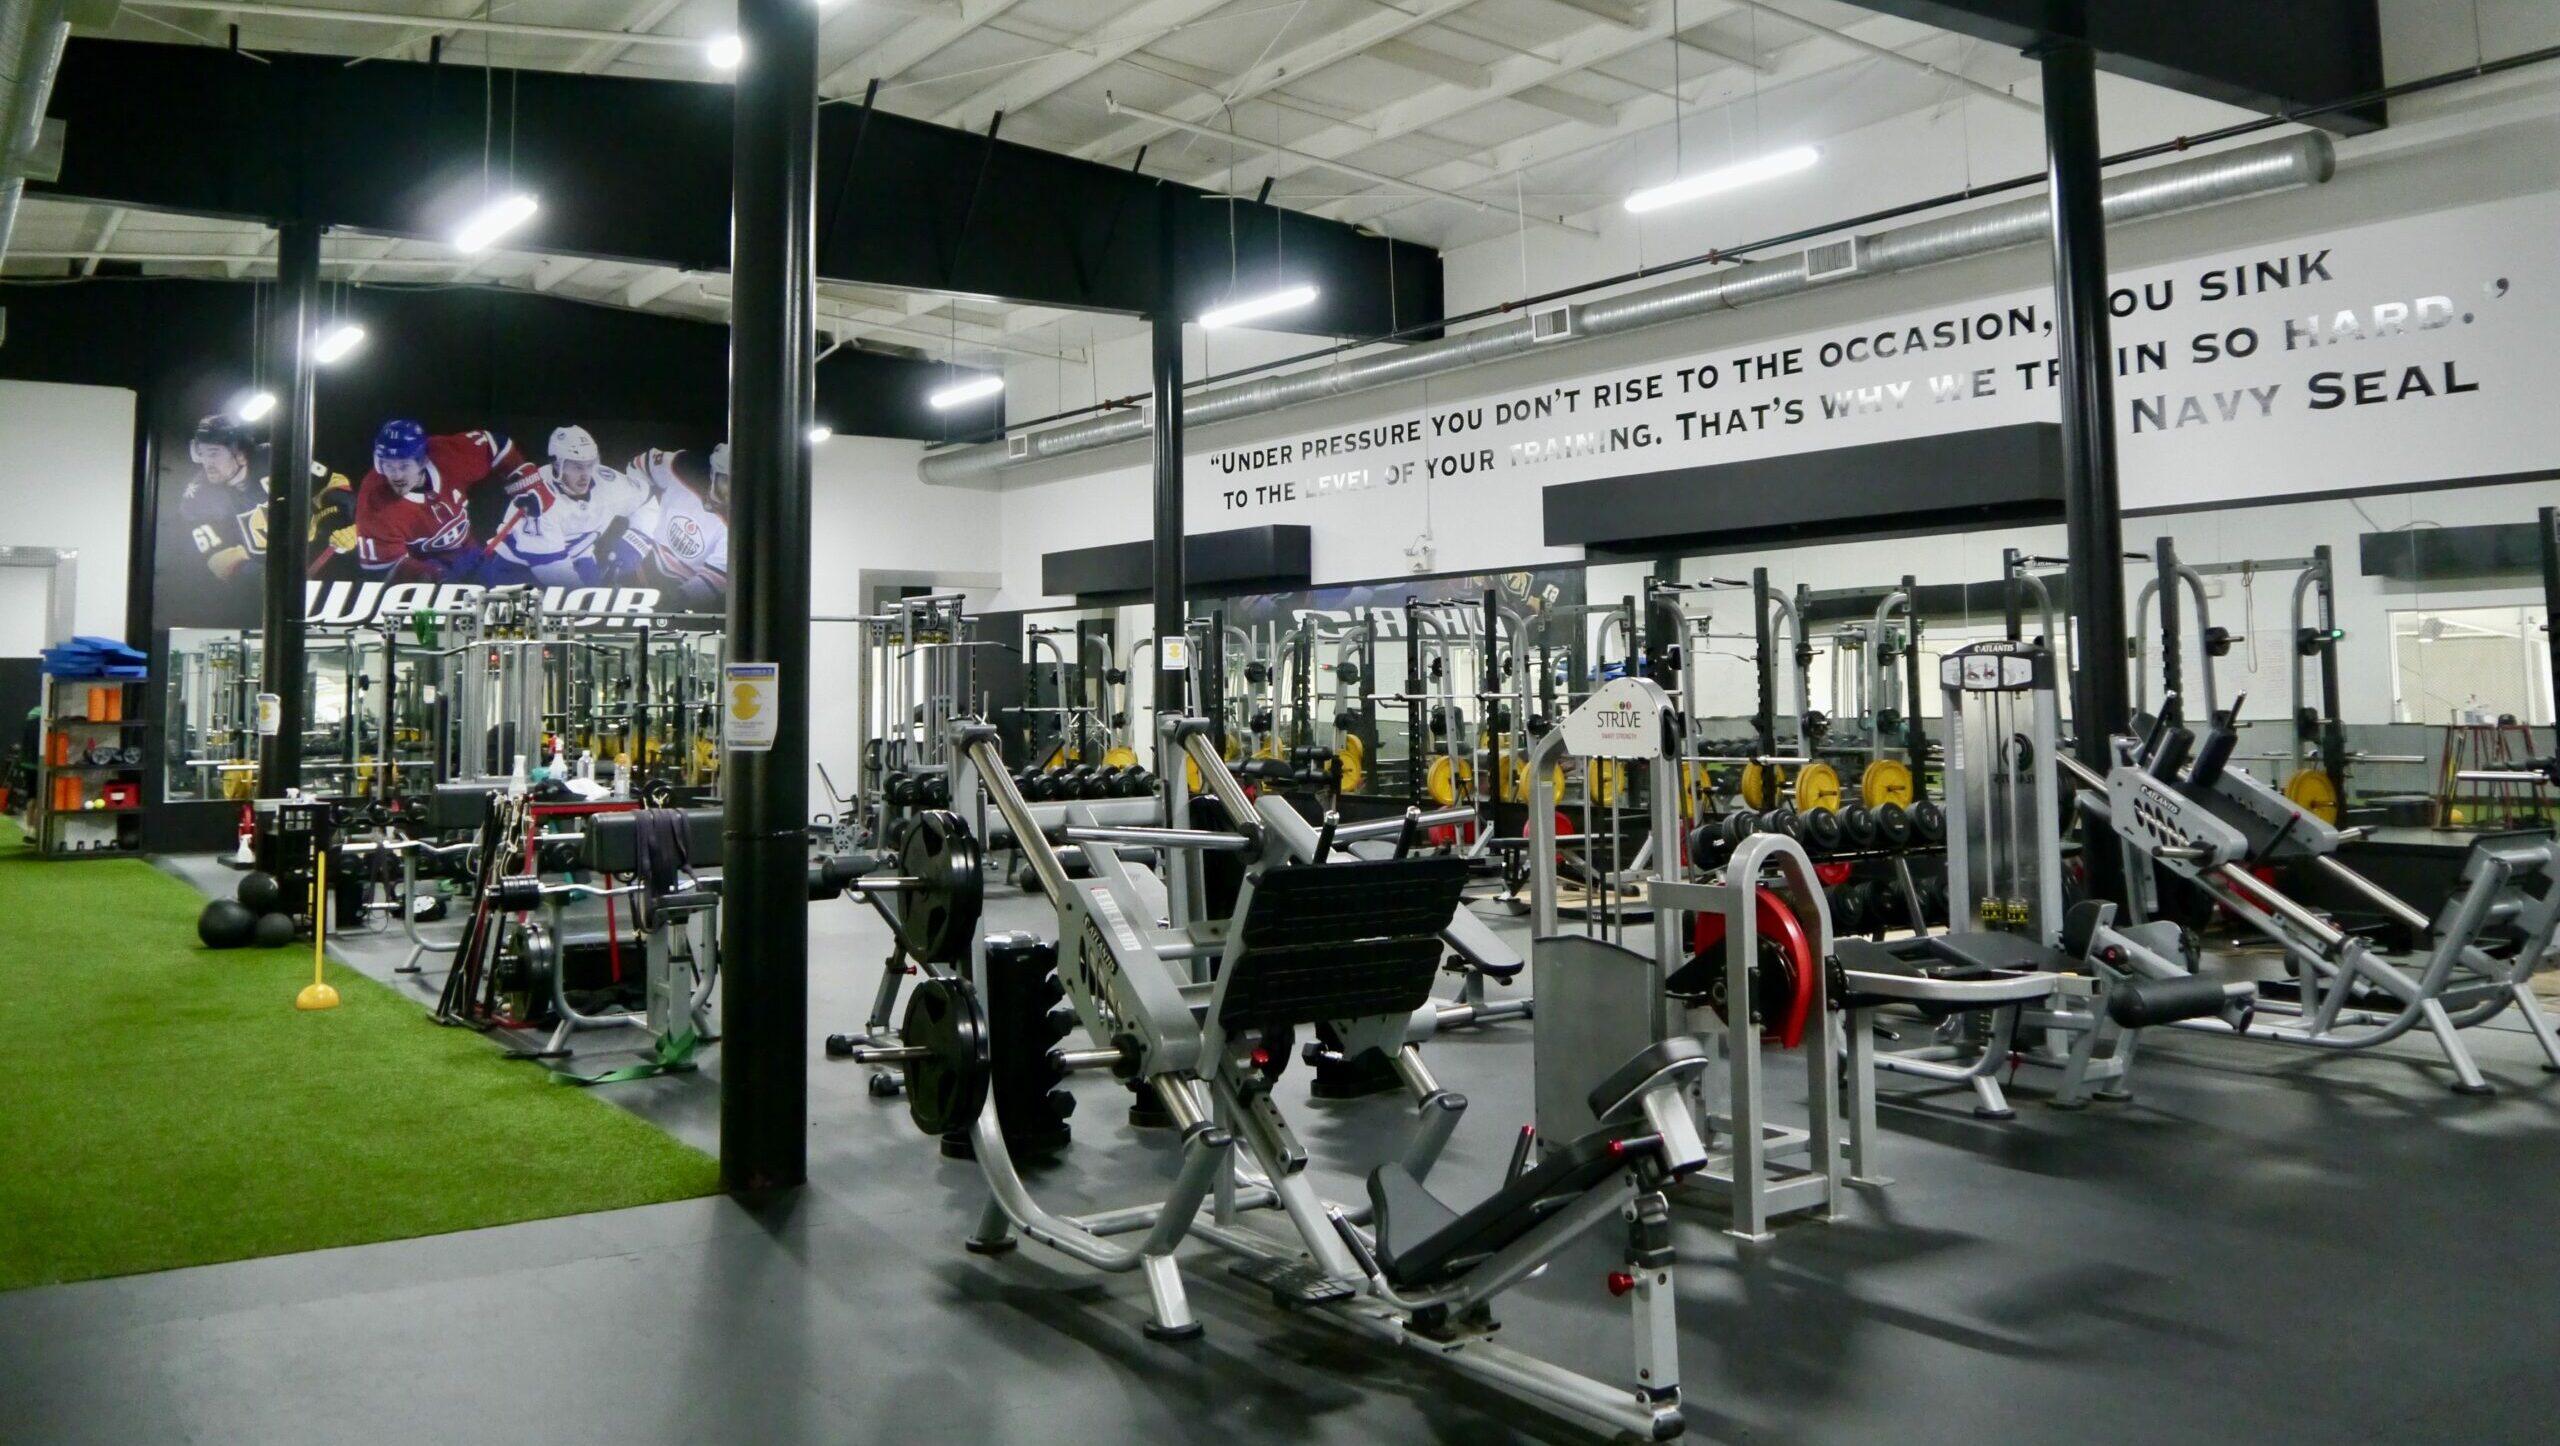 Warrior Gym copy